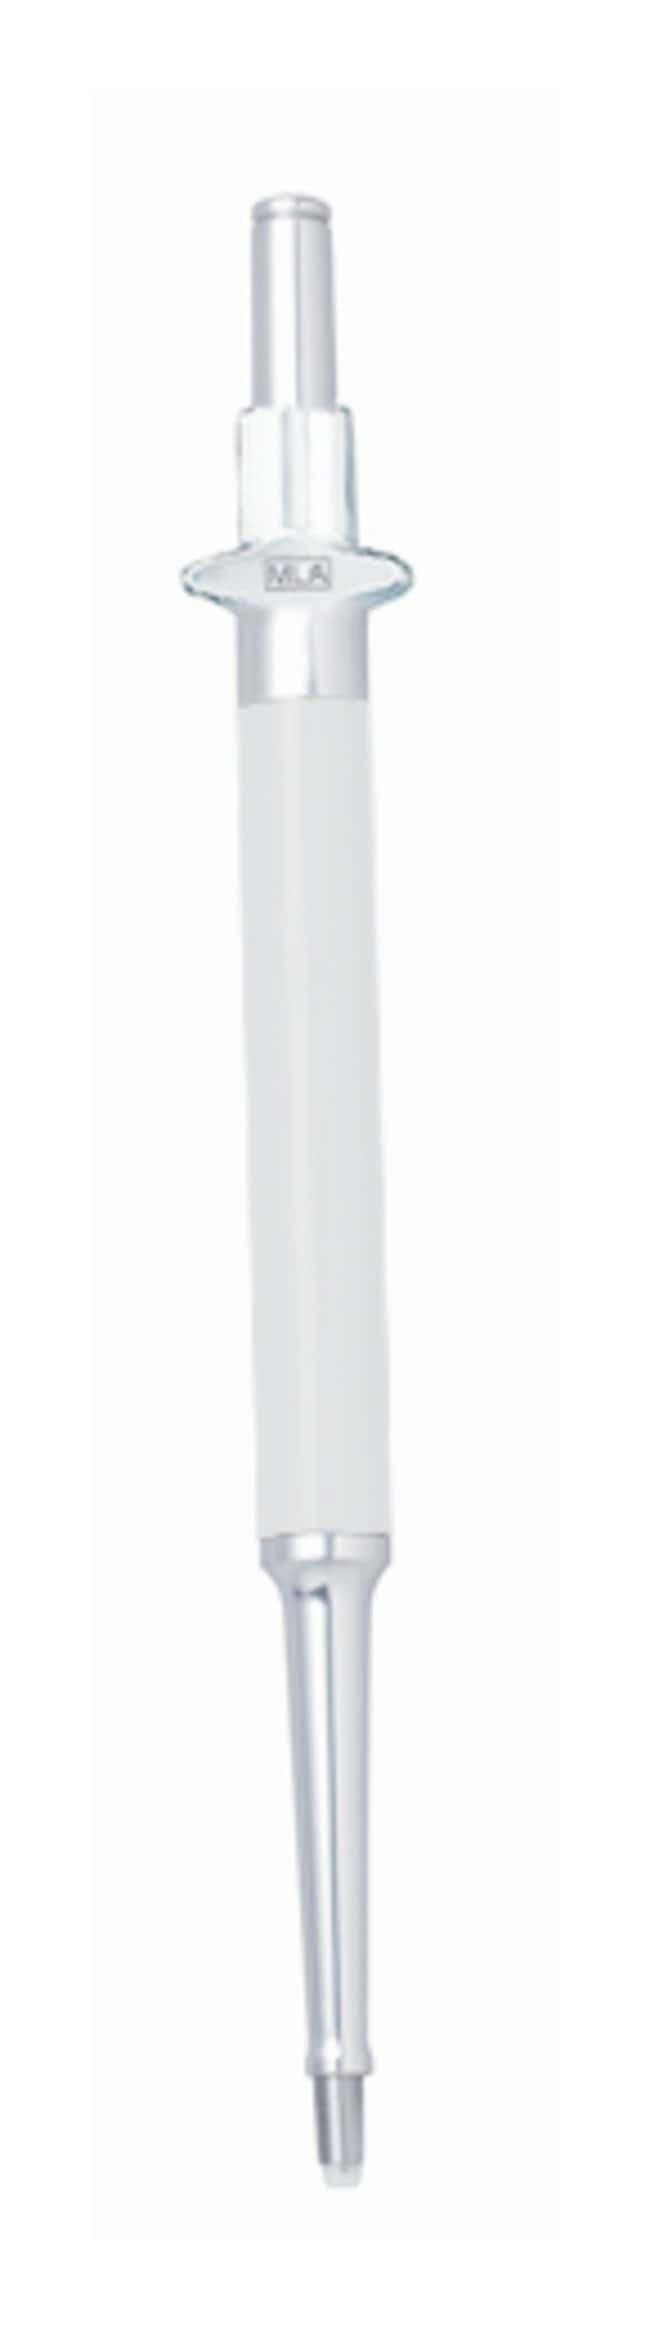 VistaLab™ TechnologiesMLA™ Brand Precision Pipetters Volume: 25μL; Color Code: White VistaLab™ TechnologiesMLA™ Brand Precision Pipetters